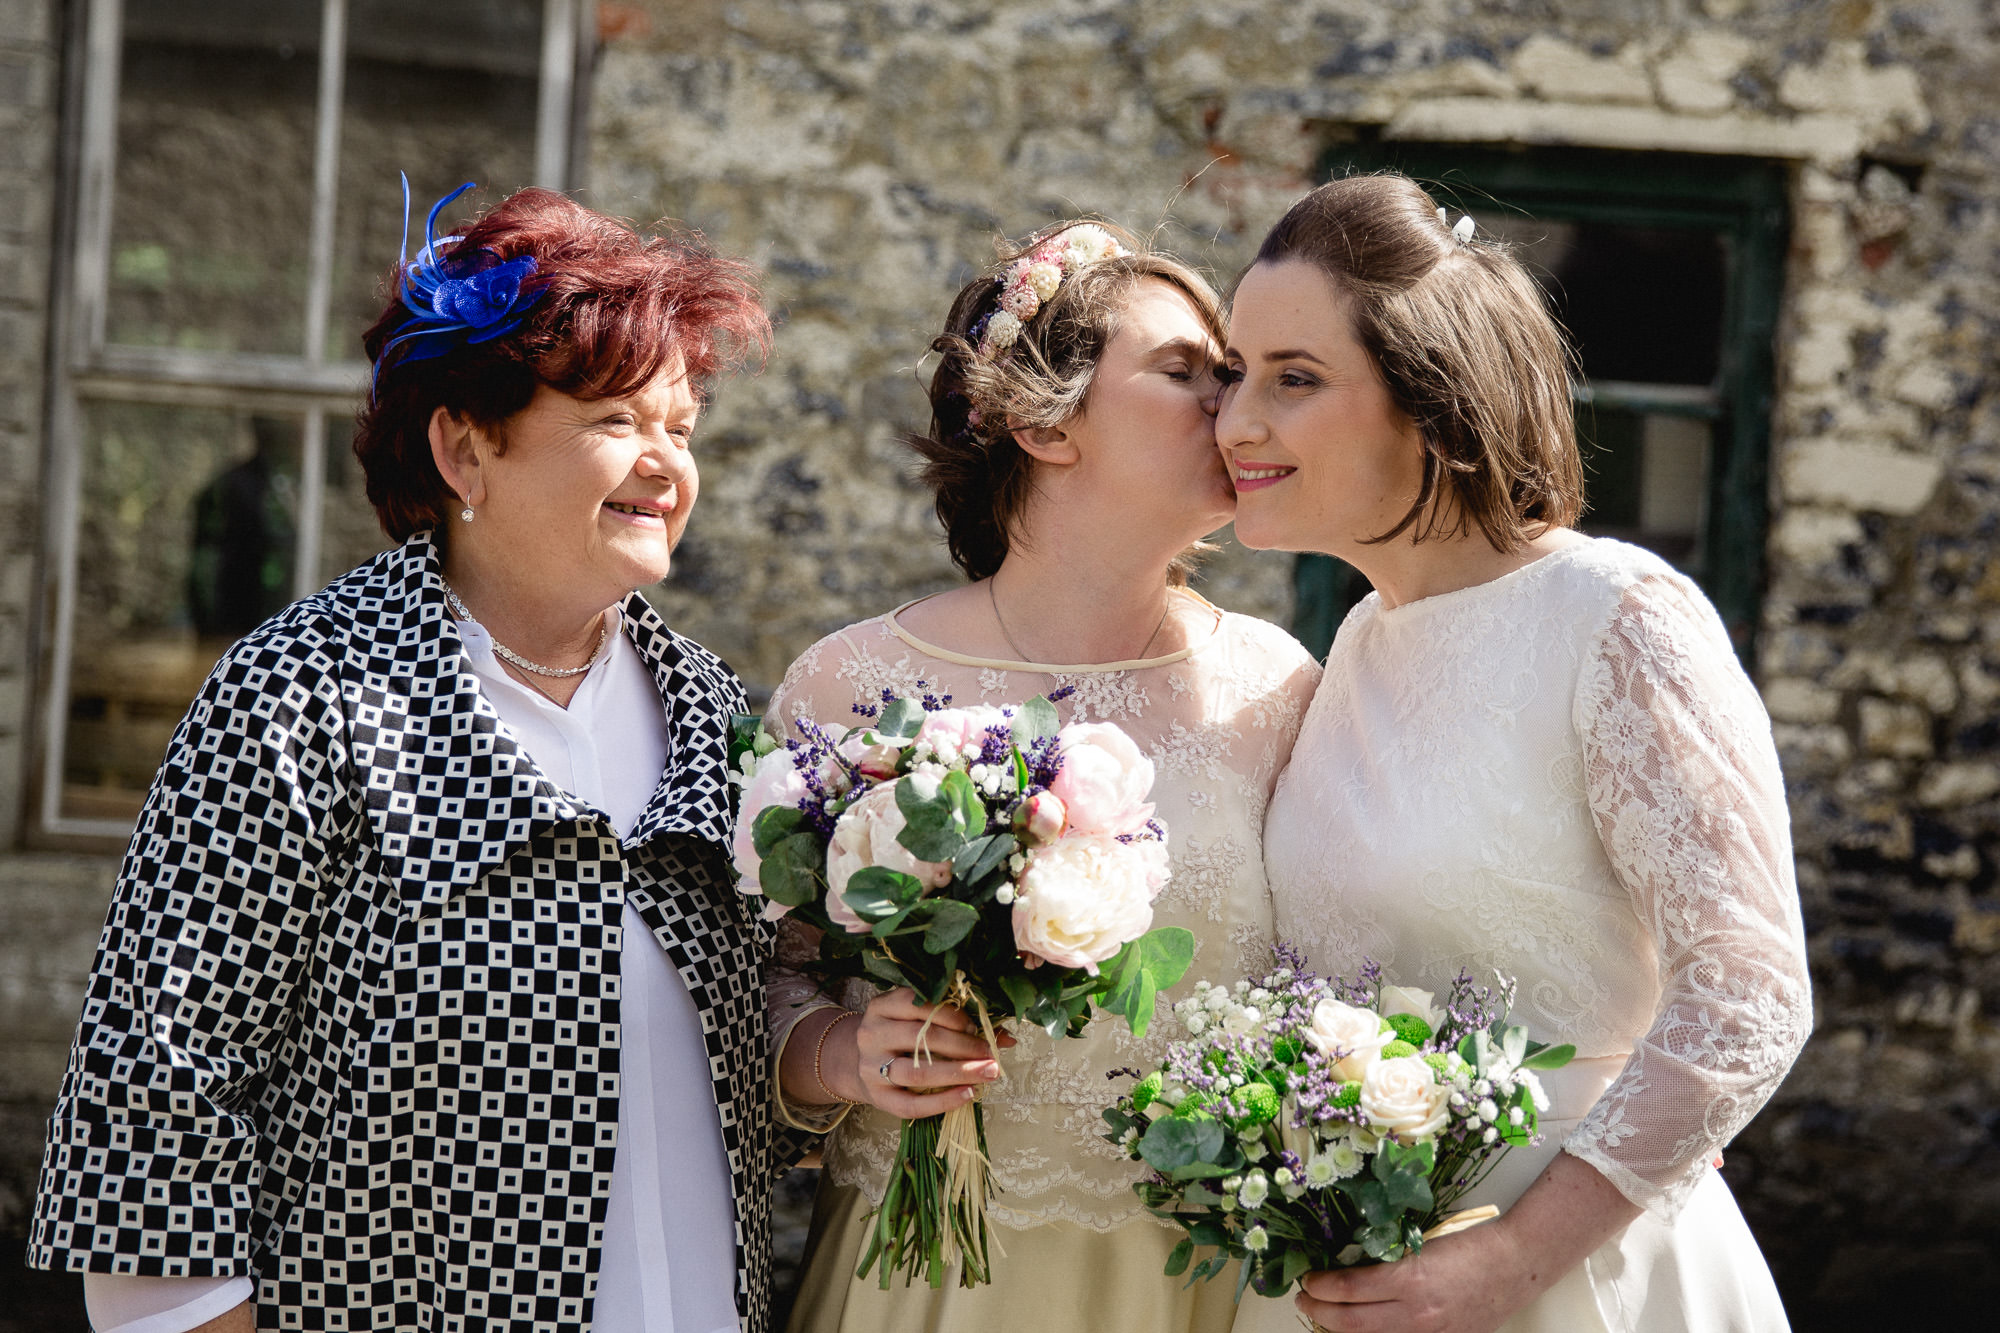 CLAIREBYRNEPHOTOGRAPHY-WEDDING-Ireland-cloncody-alternative-fun-Jen-Helena-15.jpg